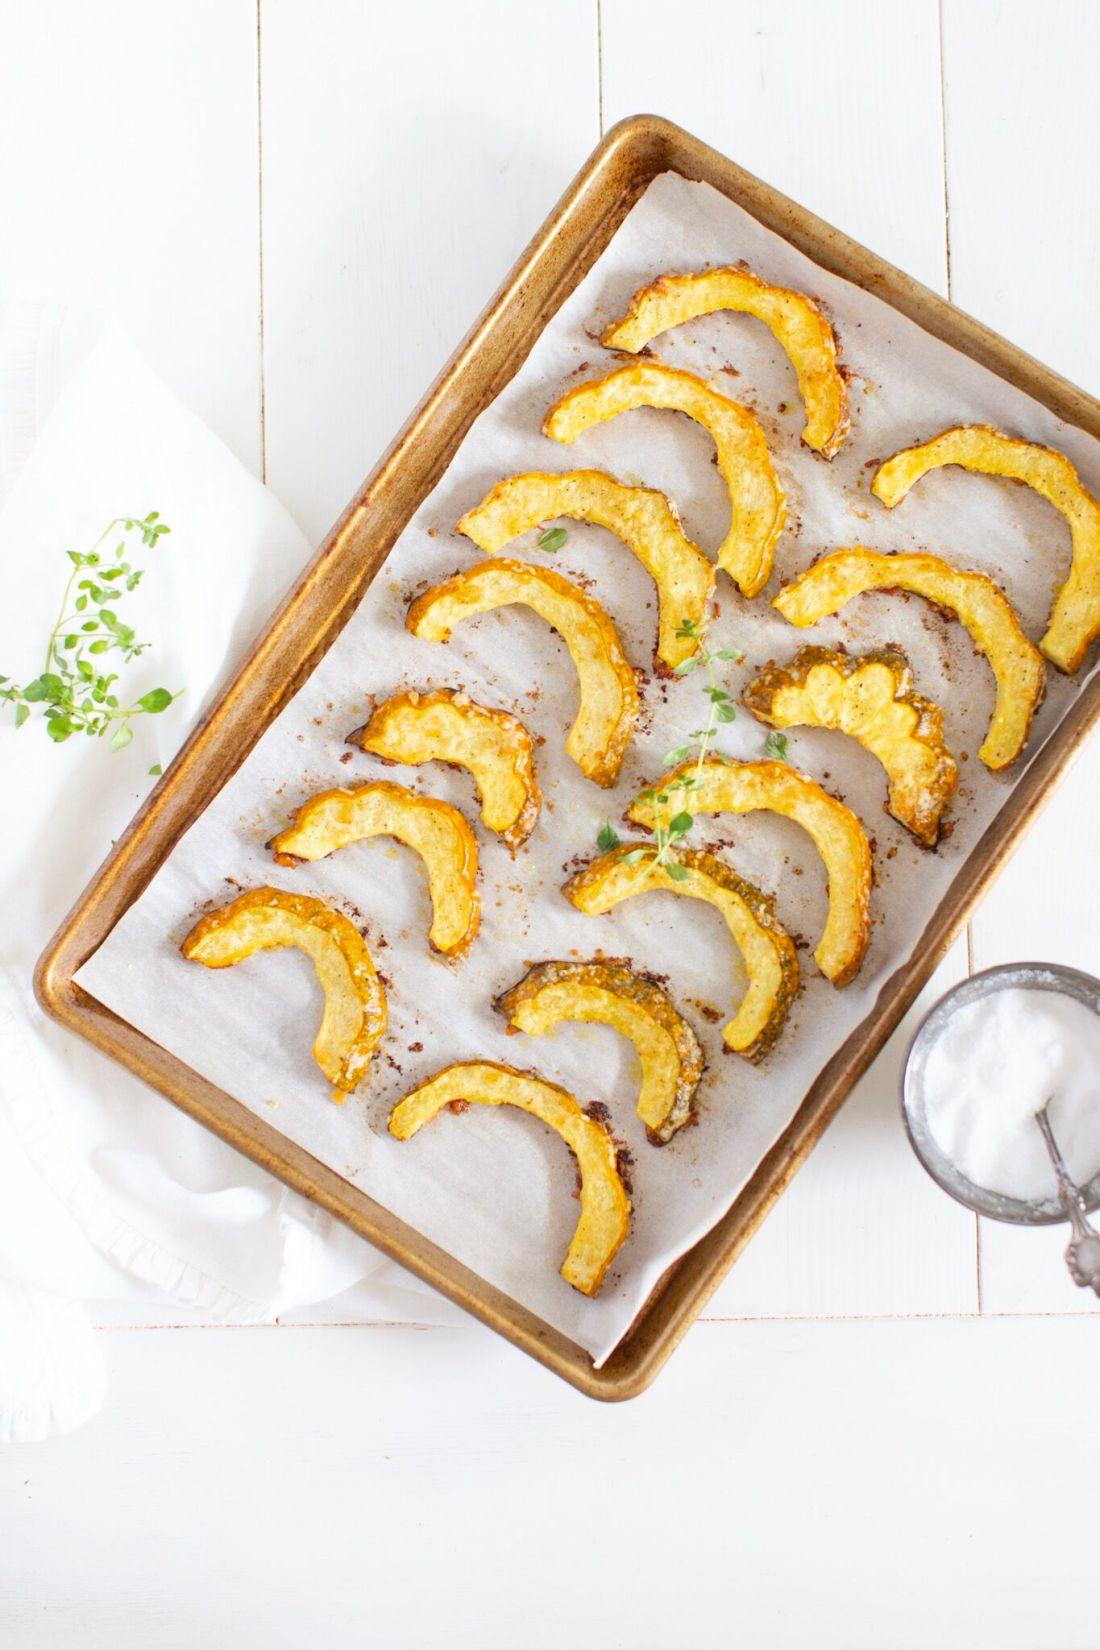 Parmesan Roasted Acorn Squash - gluten free